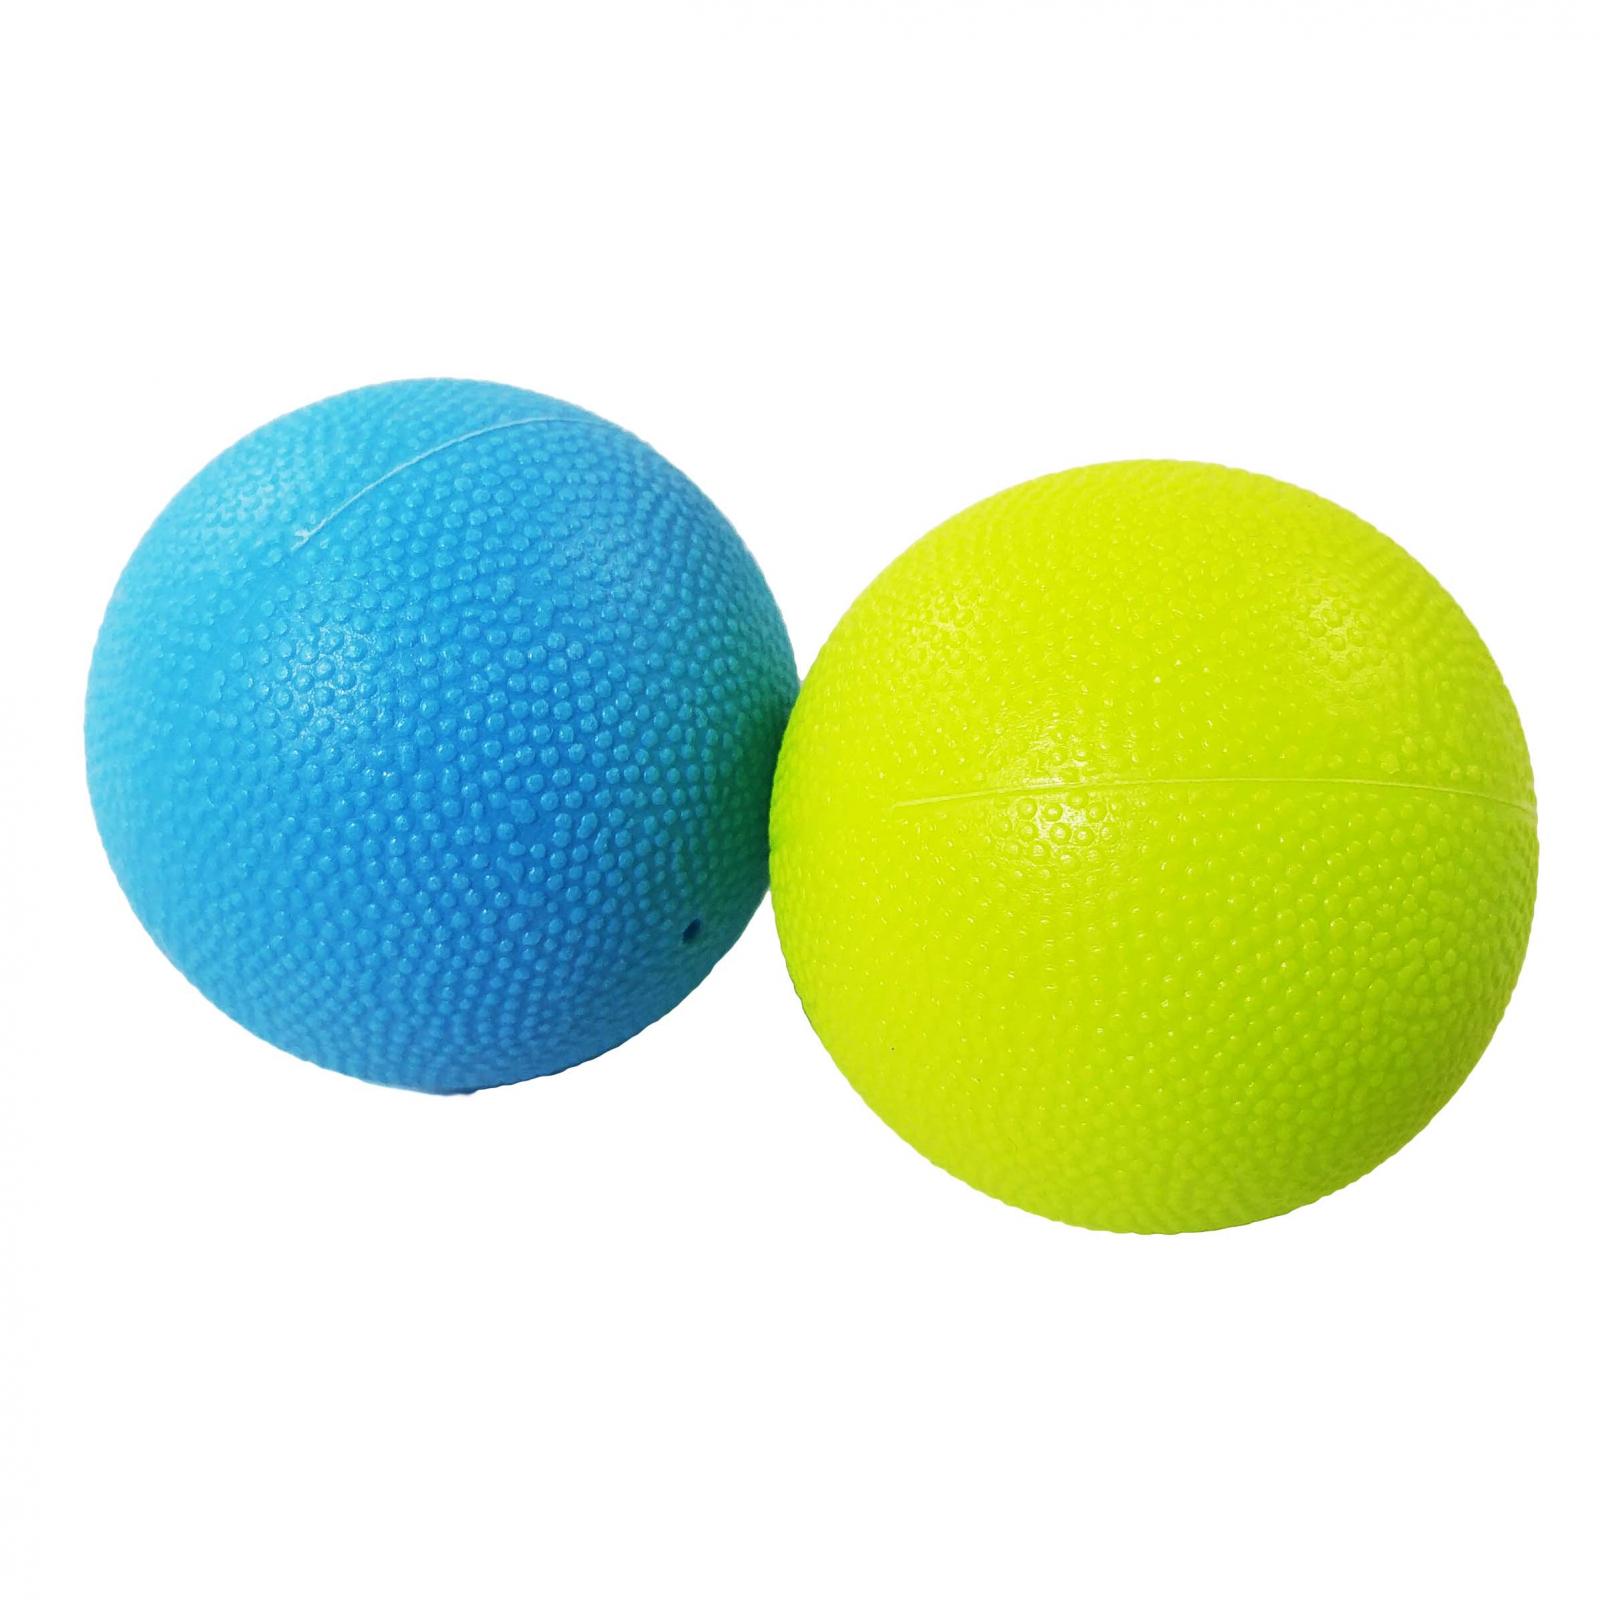 TychoTyke Kids Tennis Rackets Outdoor Exercise Play Set